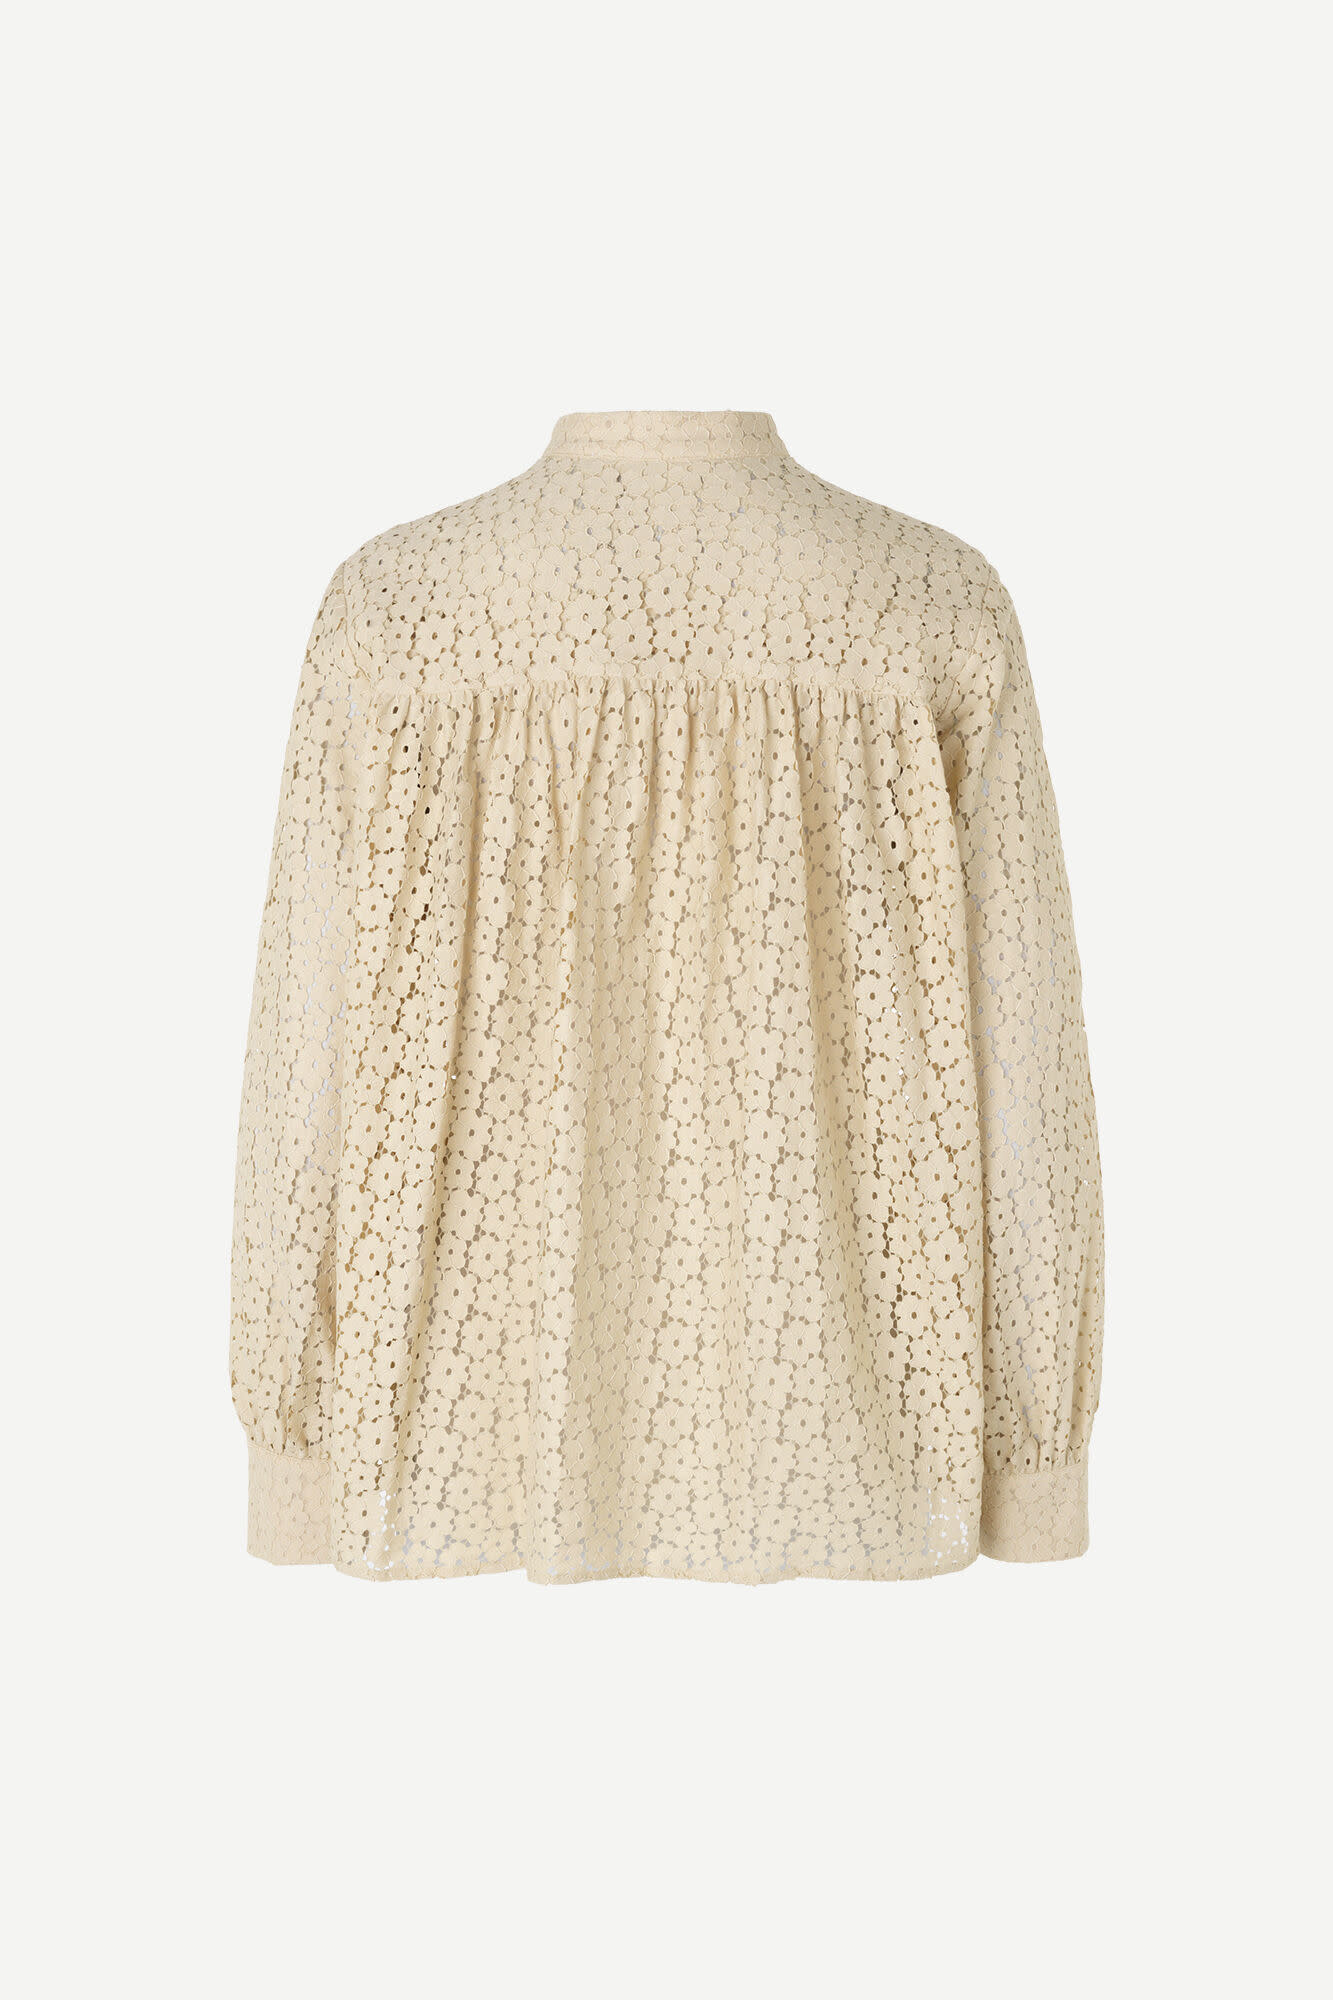 Kiana Brown Rice Embroidery Blouse-2